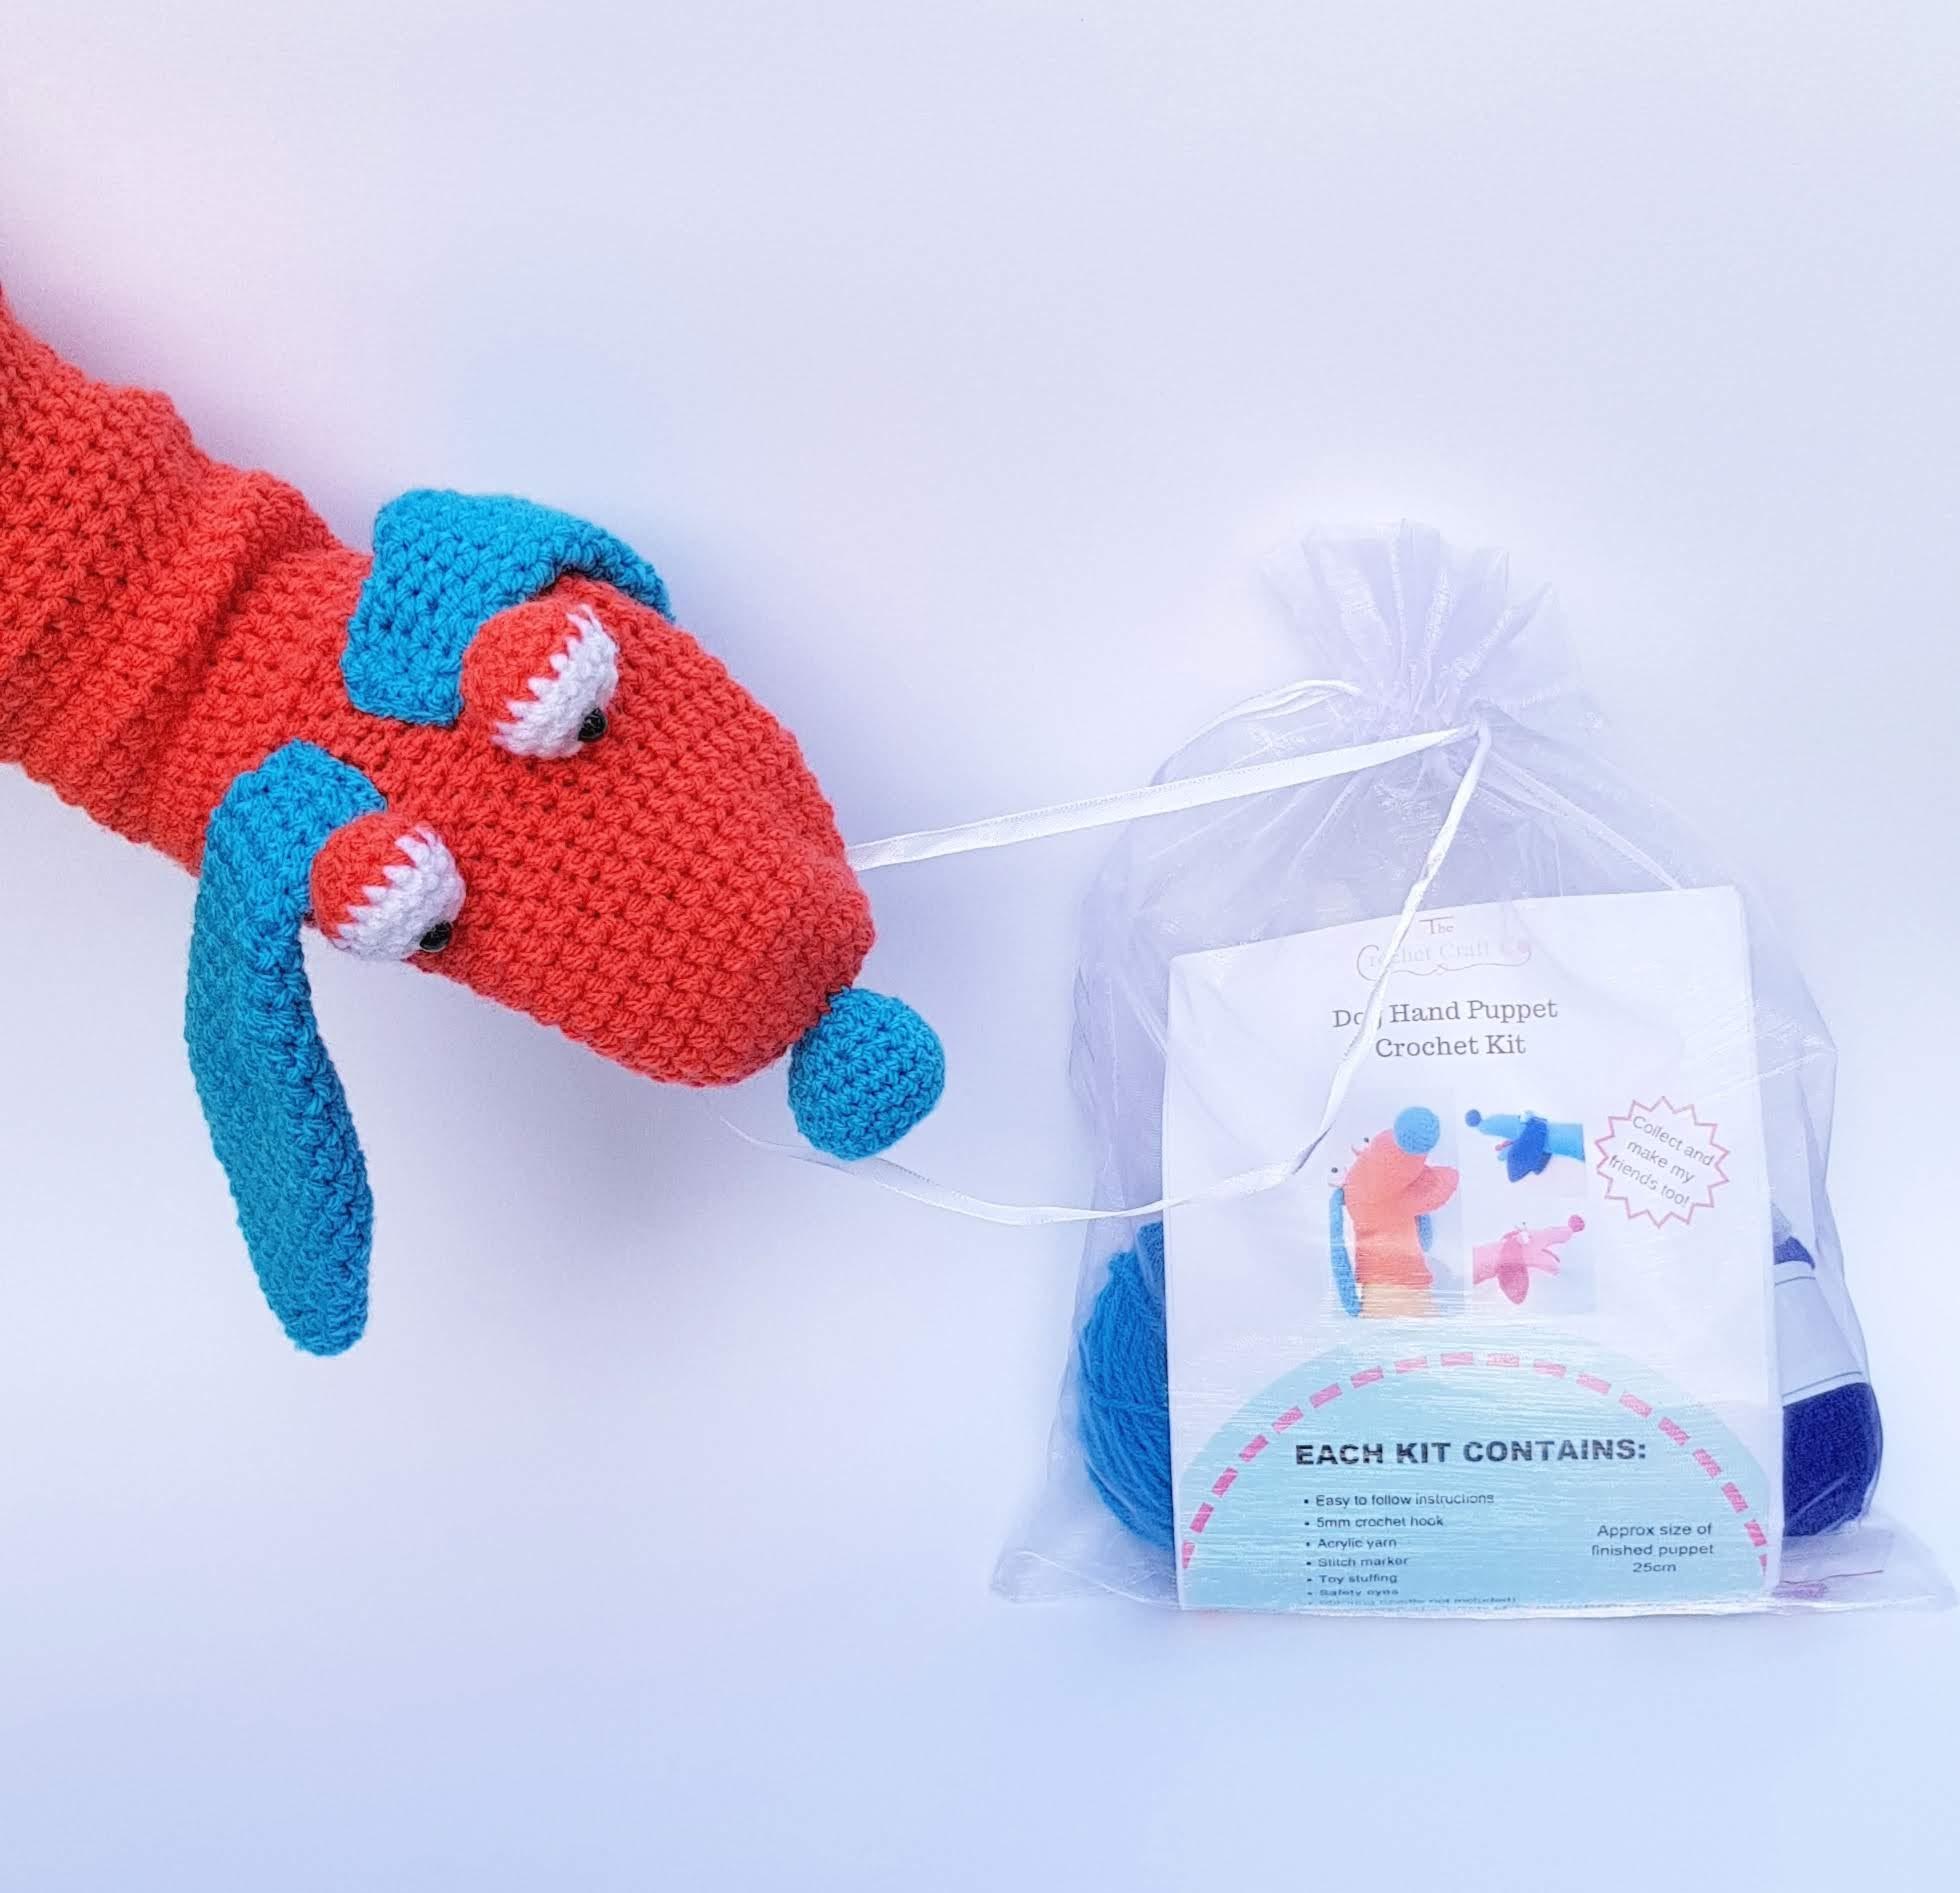 Dumbo Octopus Amigurumi Pattern & Kit – Tiny Rabbit Hole by Angie | 1893x1960